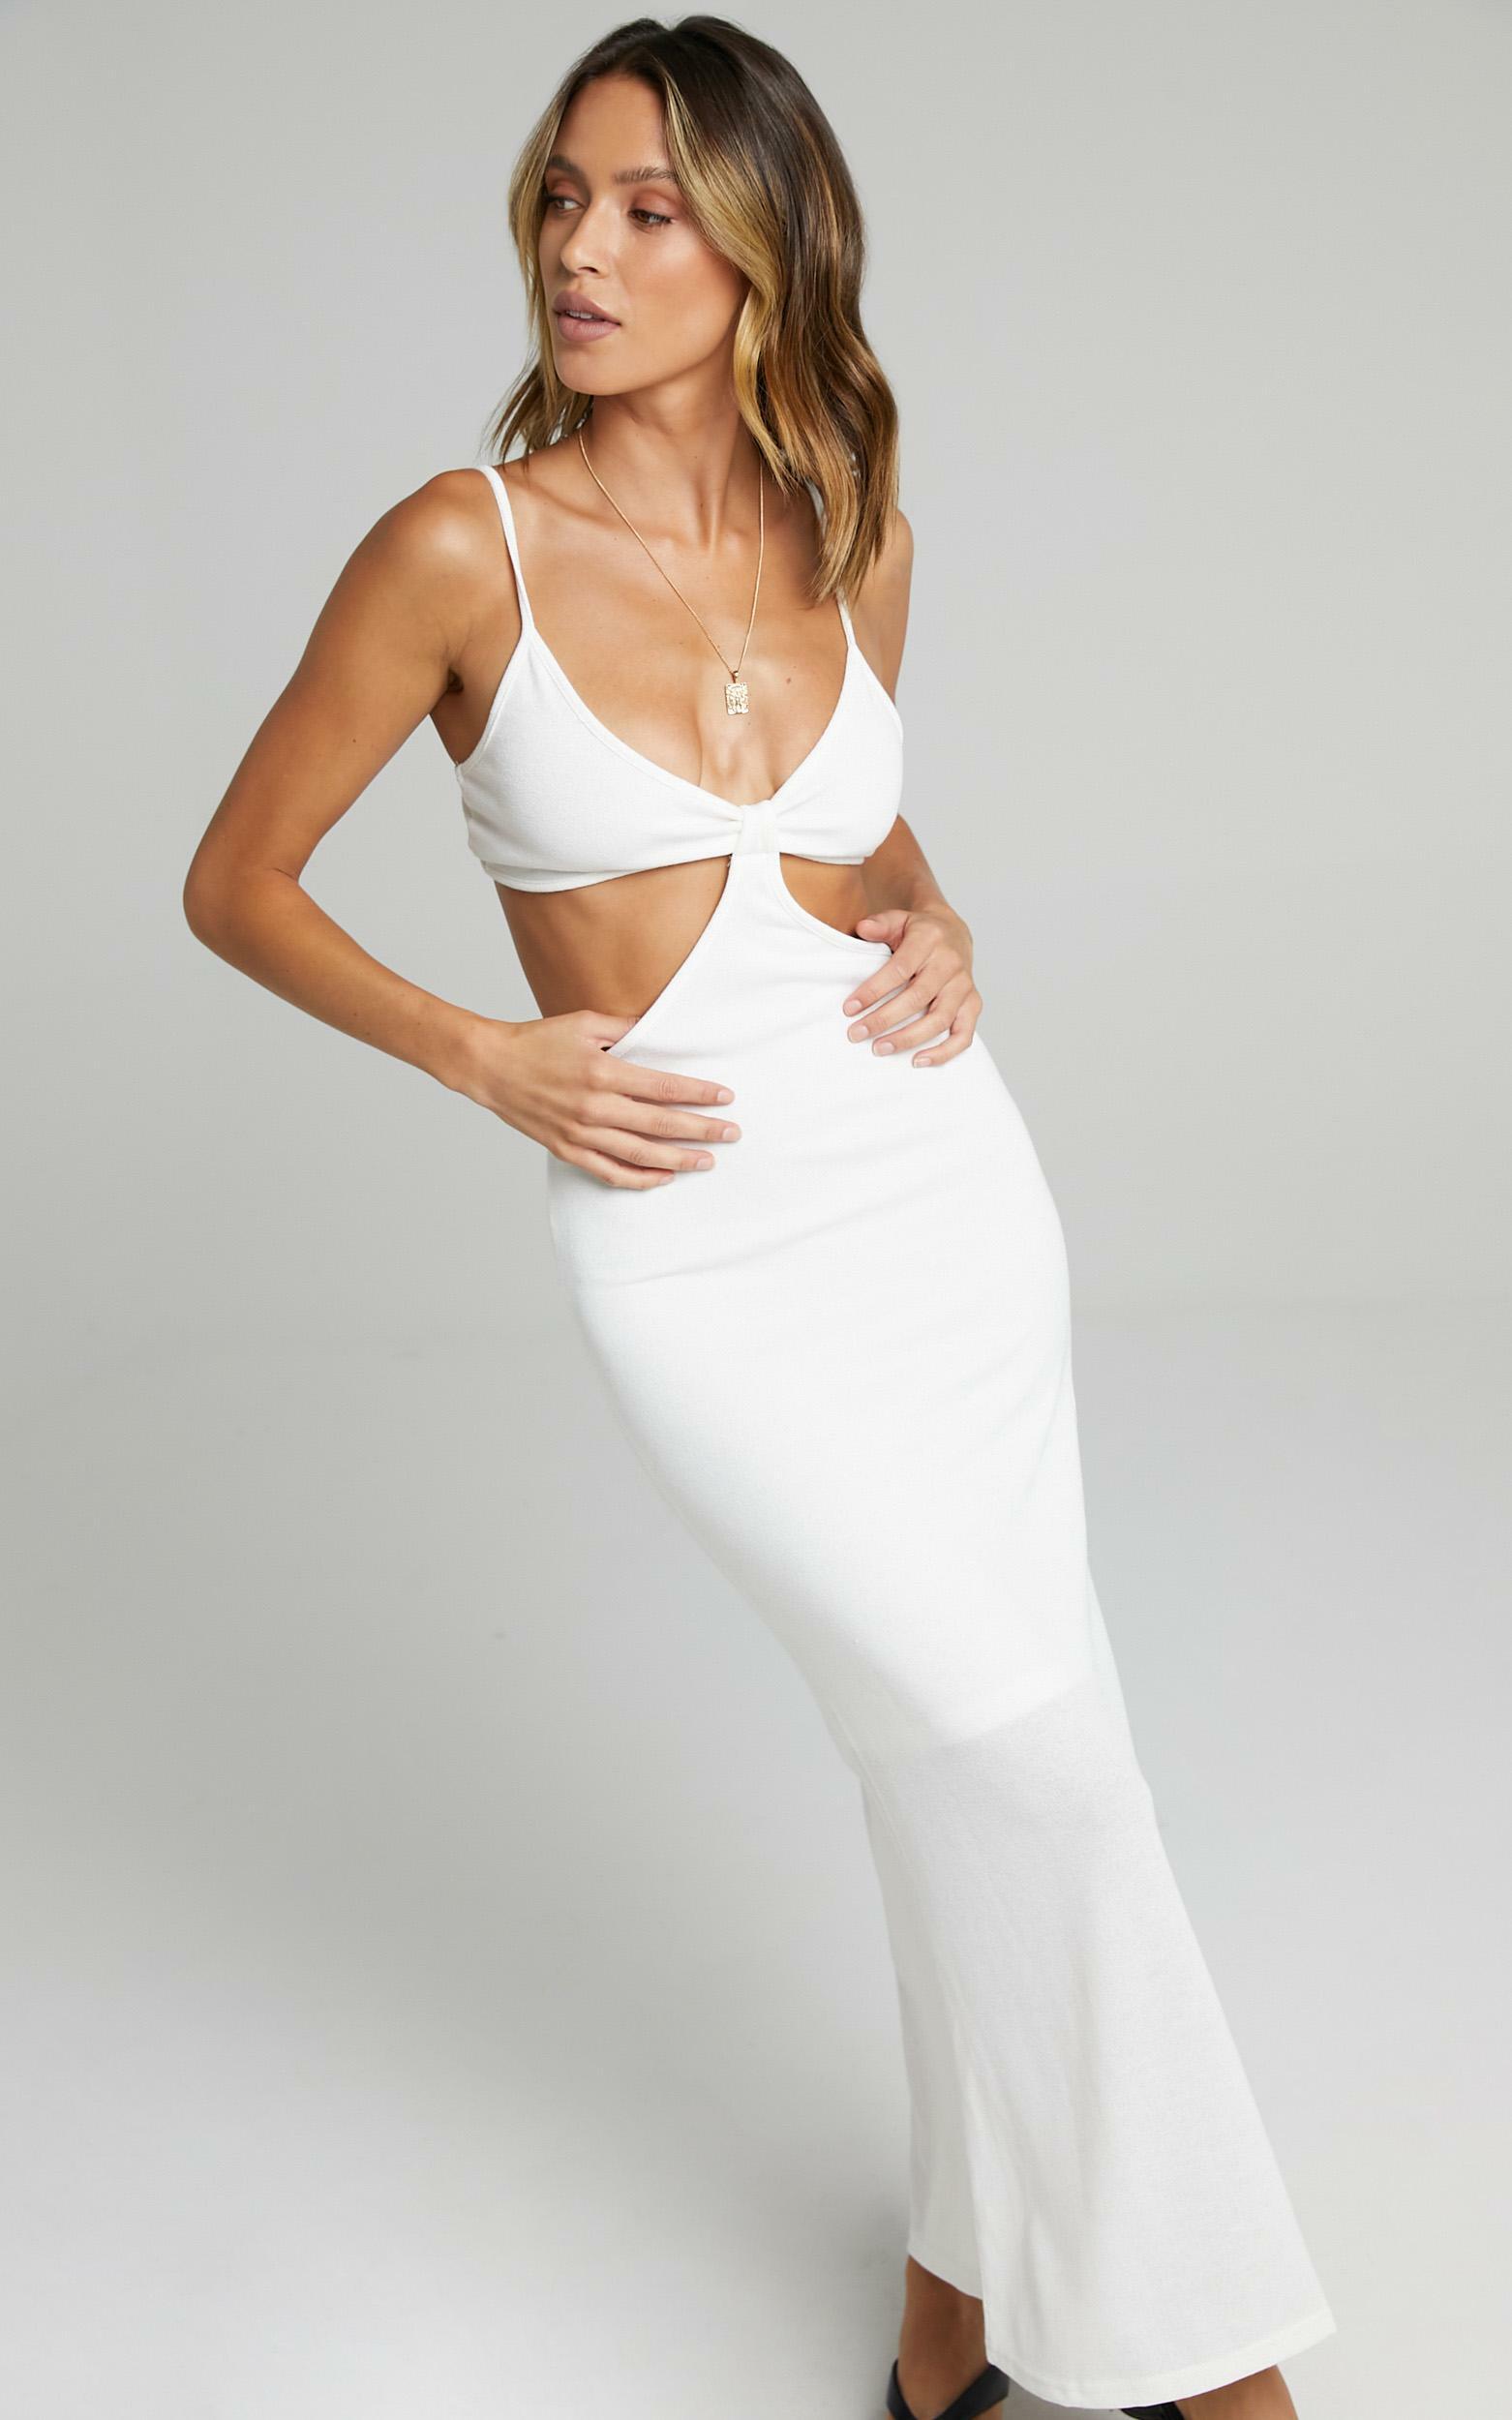 Kessandra Dress in White - 6 (XS), White, hi-res image number null